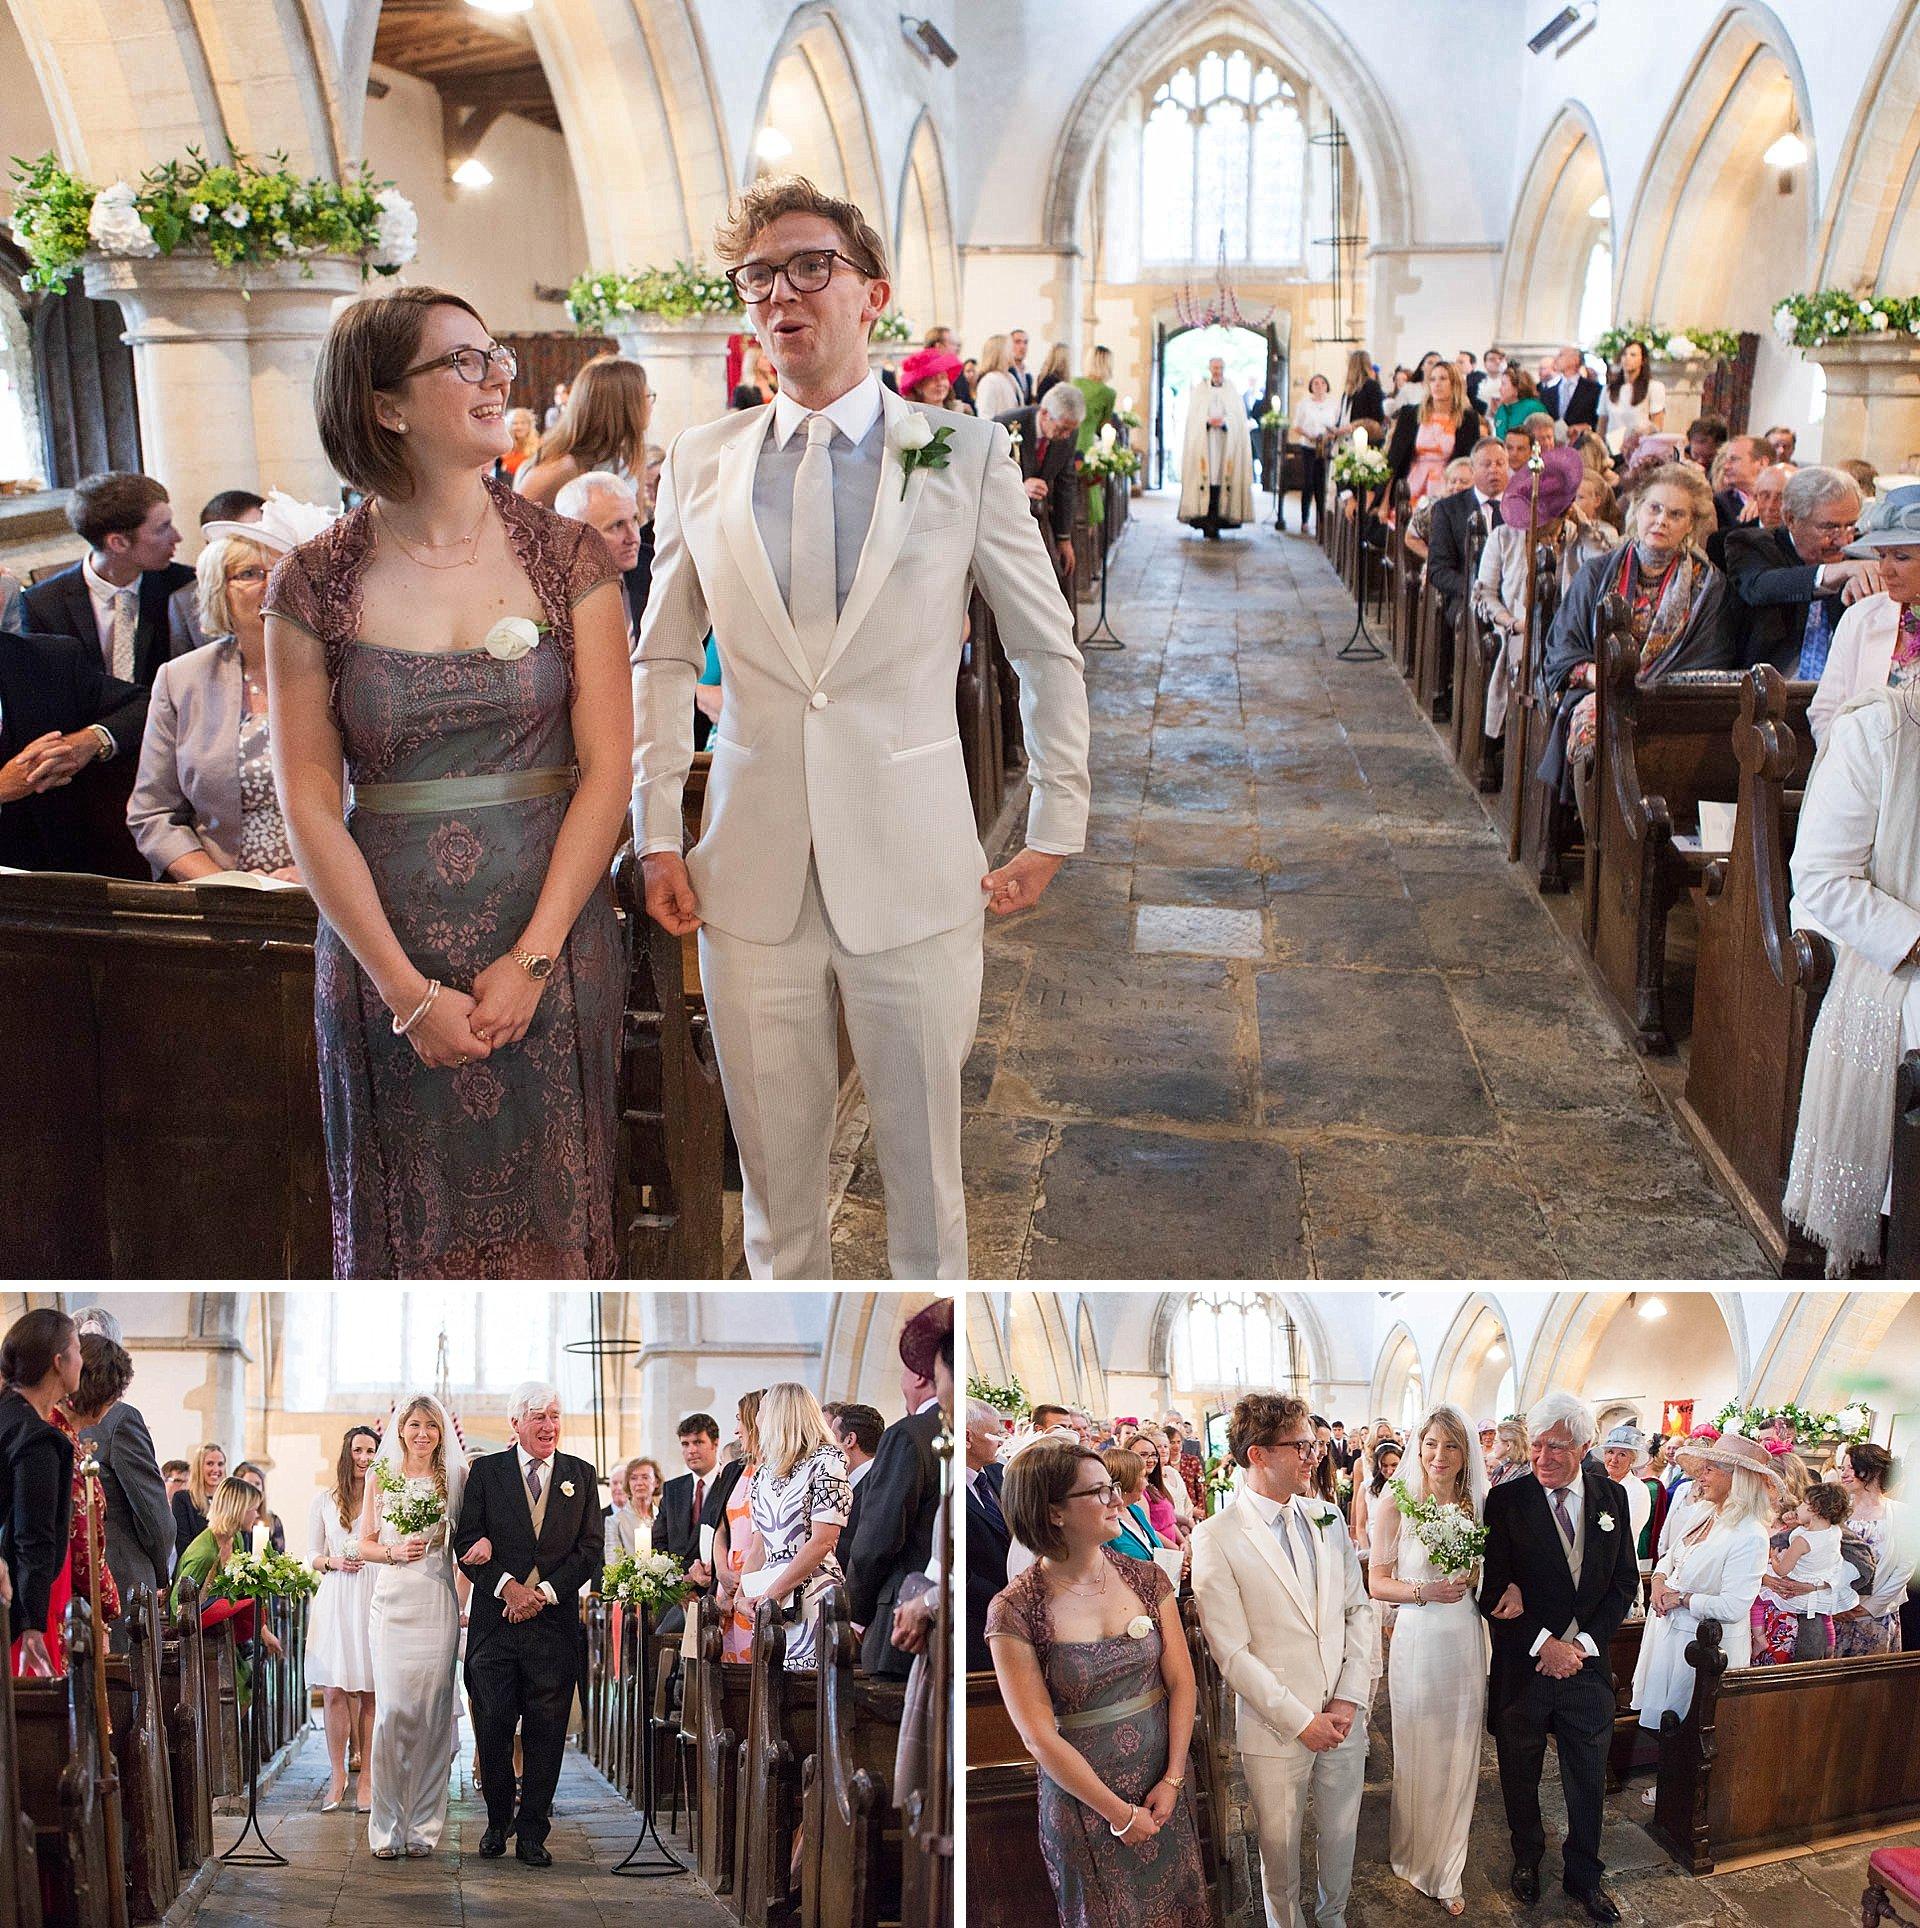 Poundon Wedding - arrival of the bride